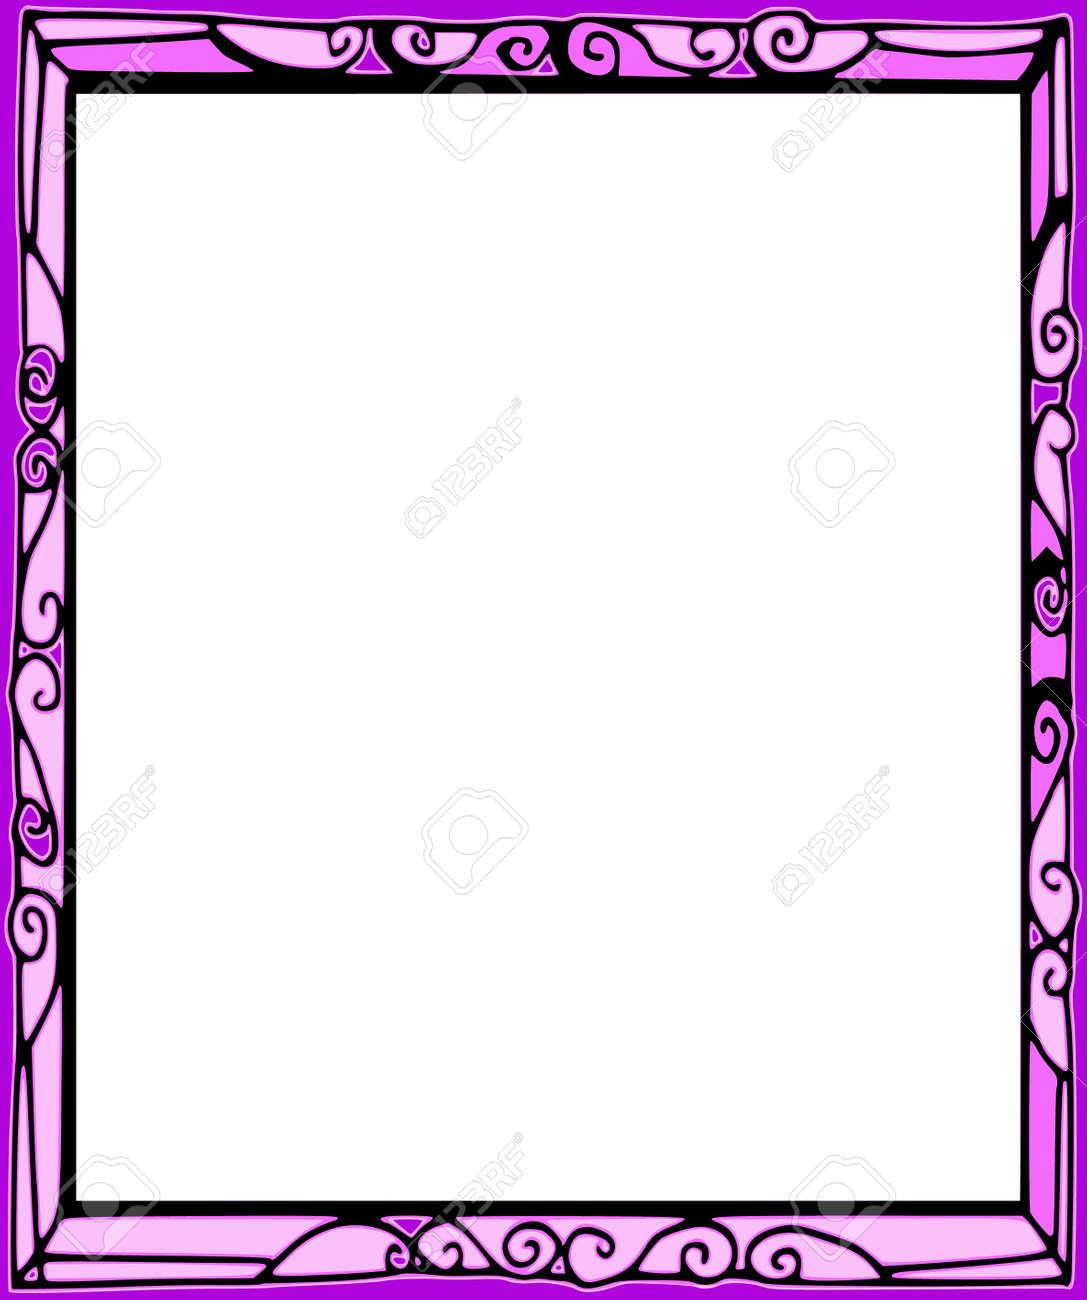 Background Series, Hand Draw Frame, Cartoon Style Stock Photo ...